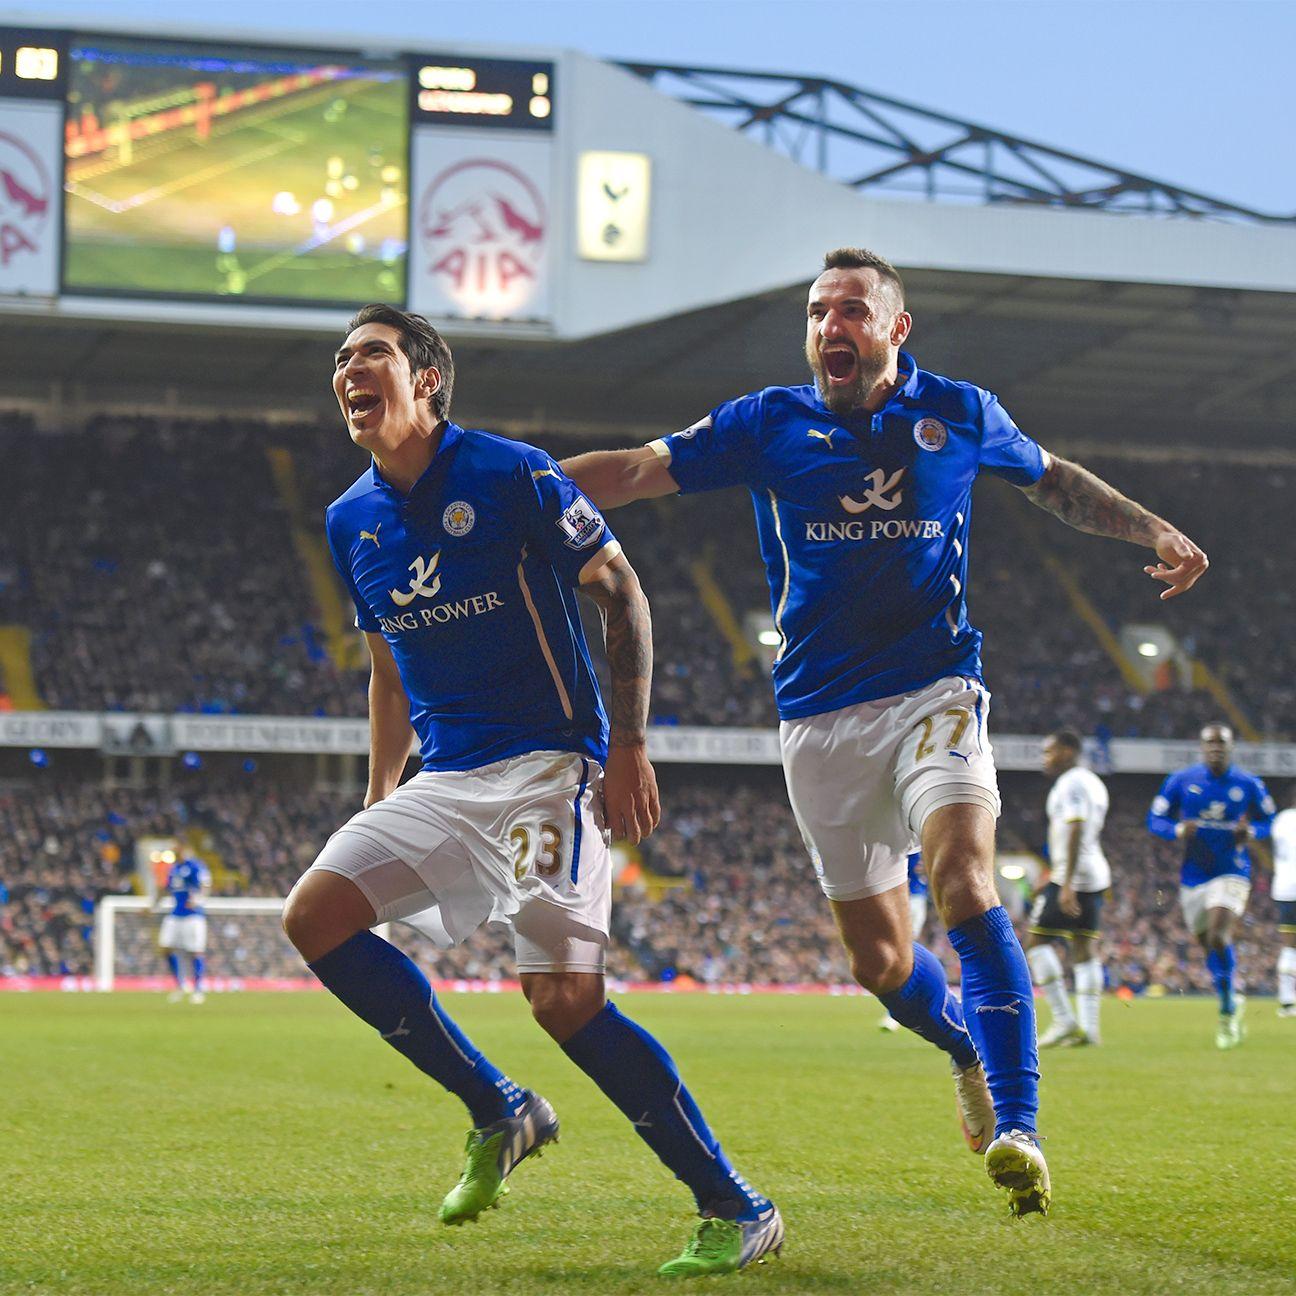 Leo Ulloa helped spark Leicester City's FA Cup comeback at Tottenham.